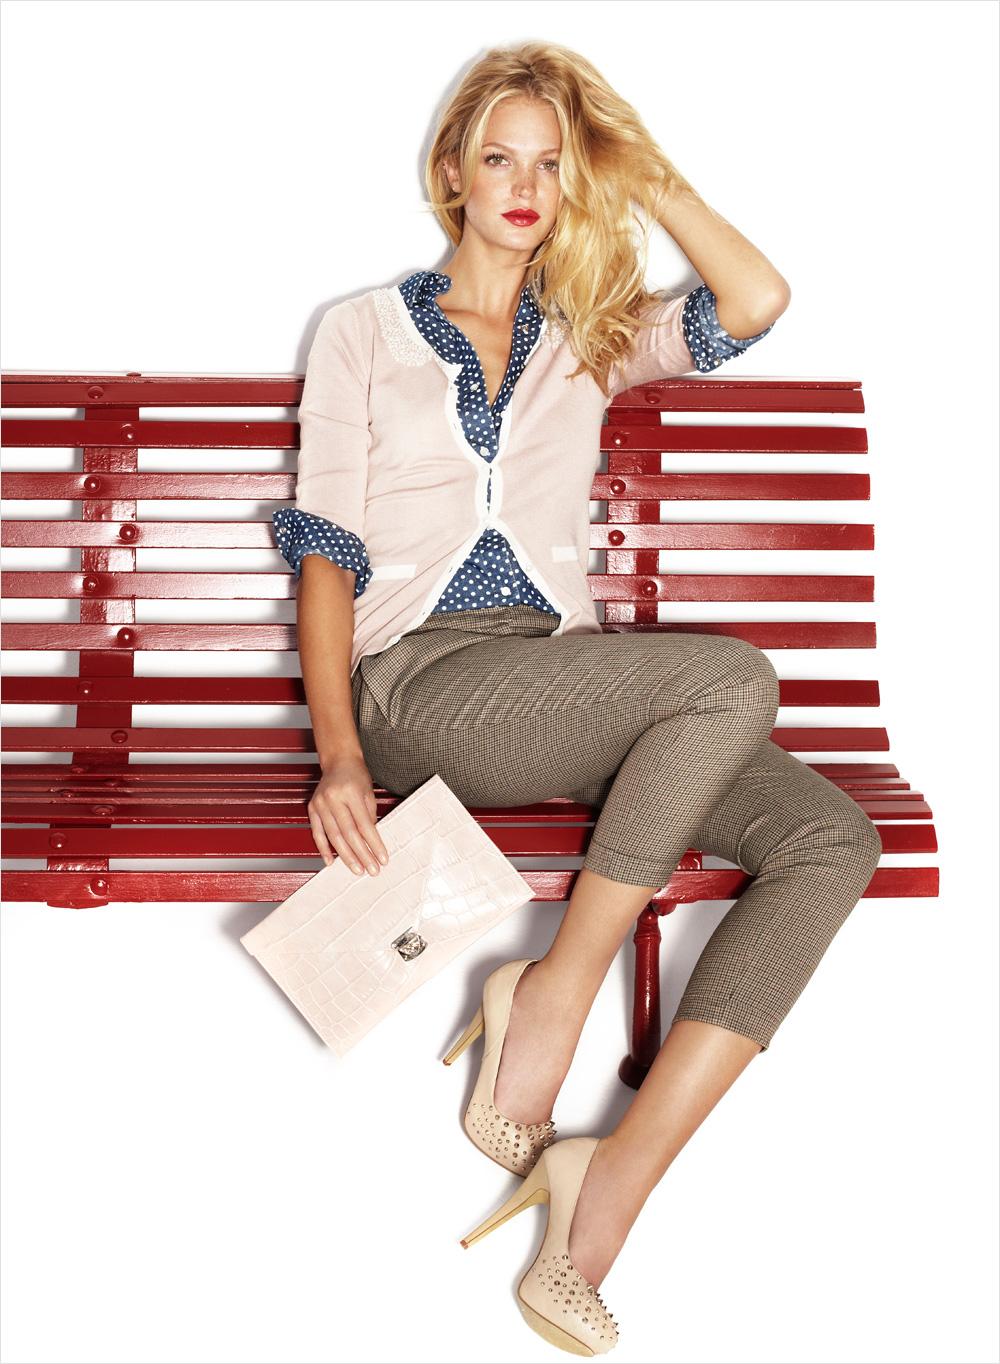 Dress designer jeans for men, Bikes stylish hayabusa